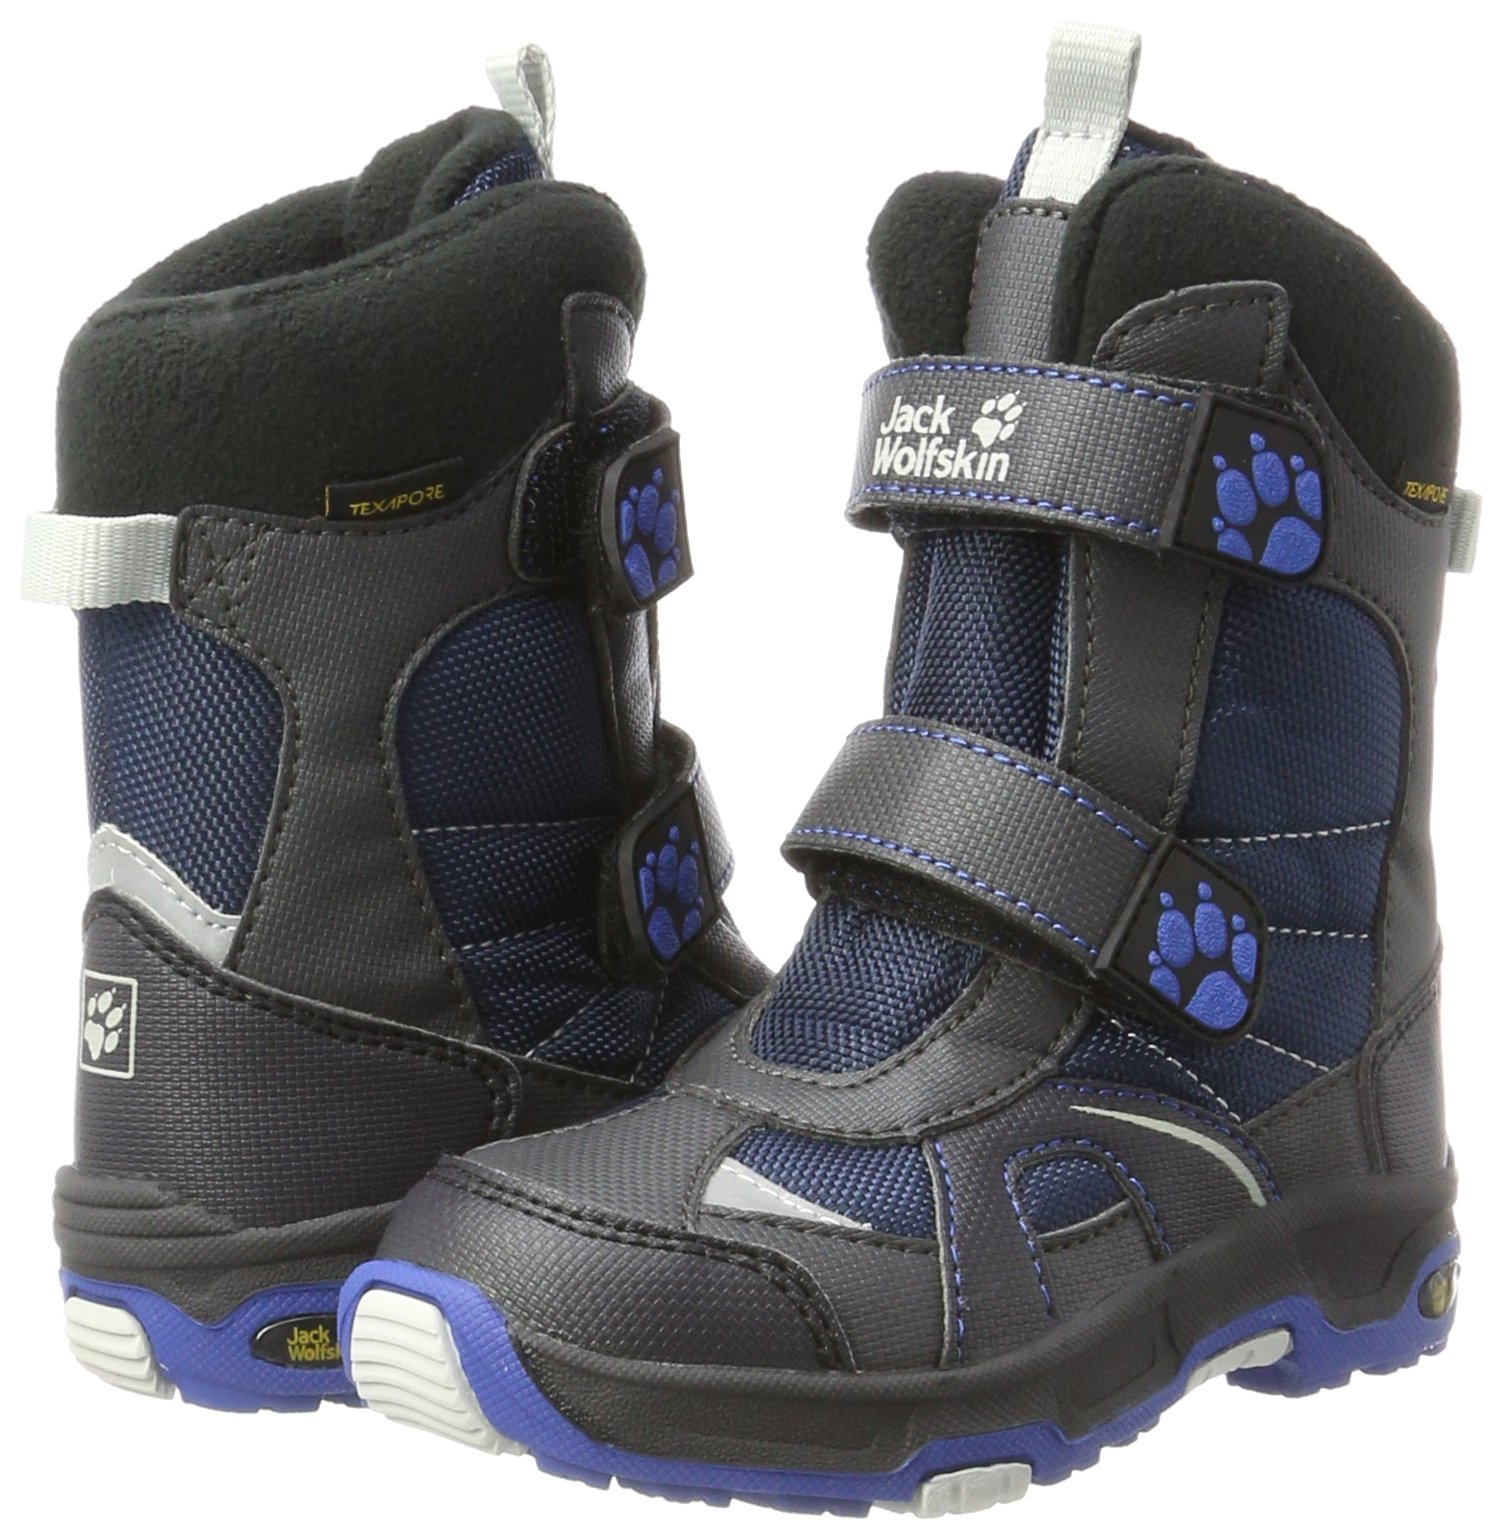 Jack Wolfskin Boy's S Polar Bear Texapore Snow Boots Child 5